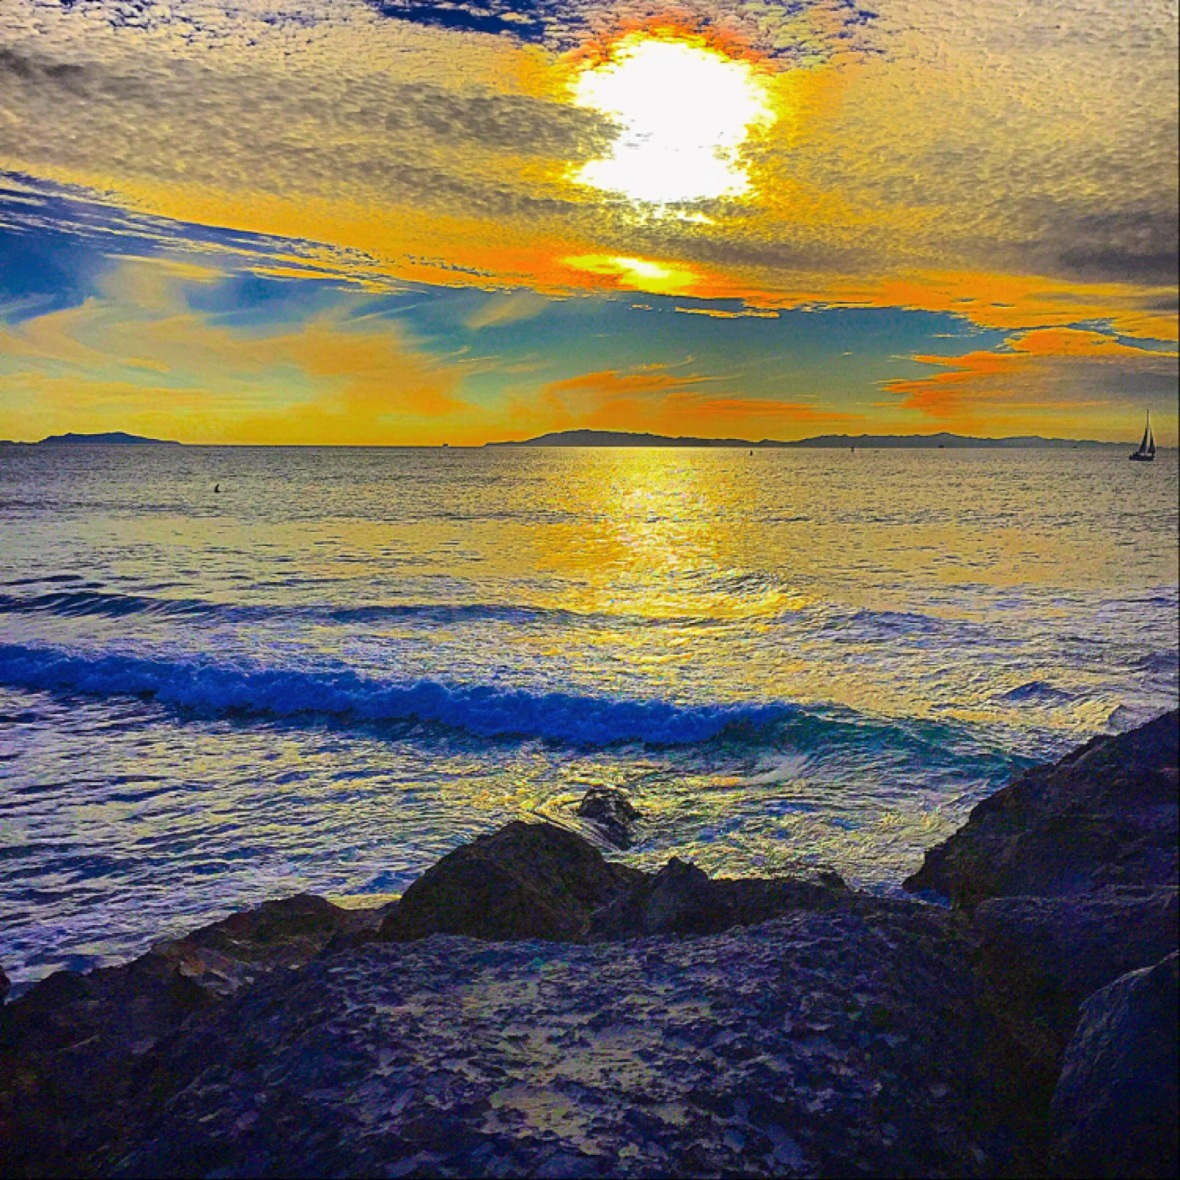 """The Light Forever Shines"" (Ventura County, CA)"